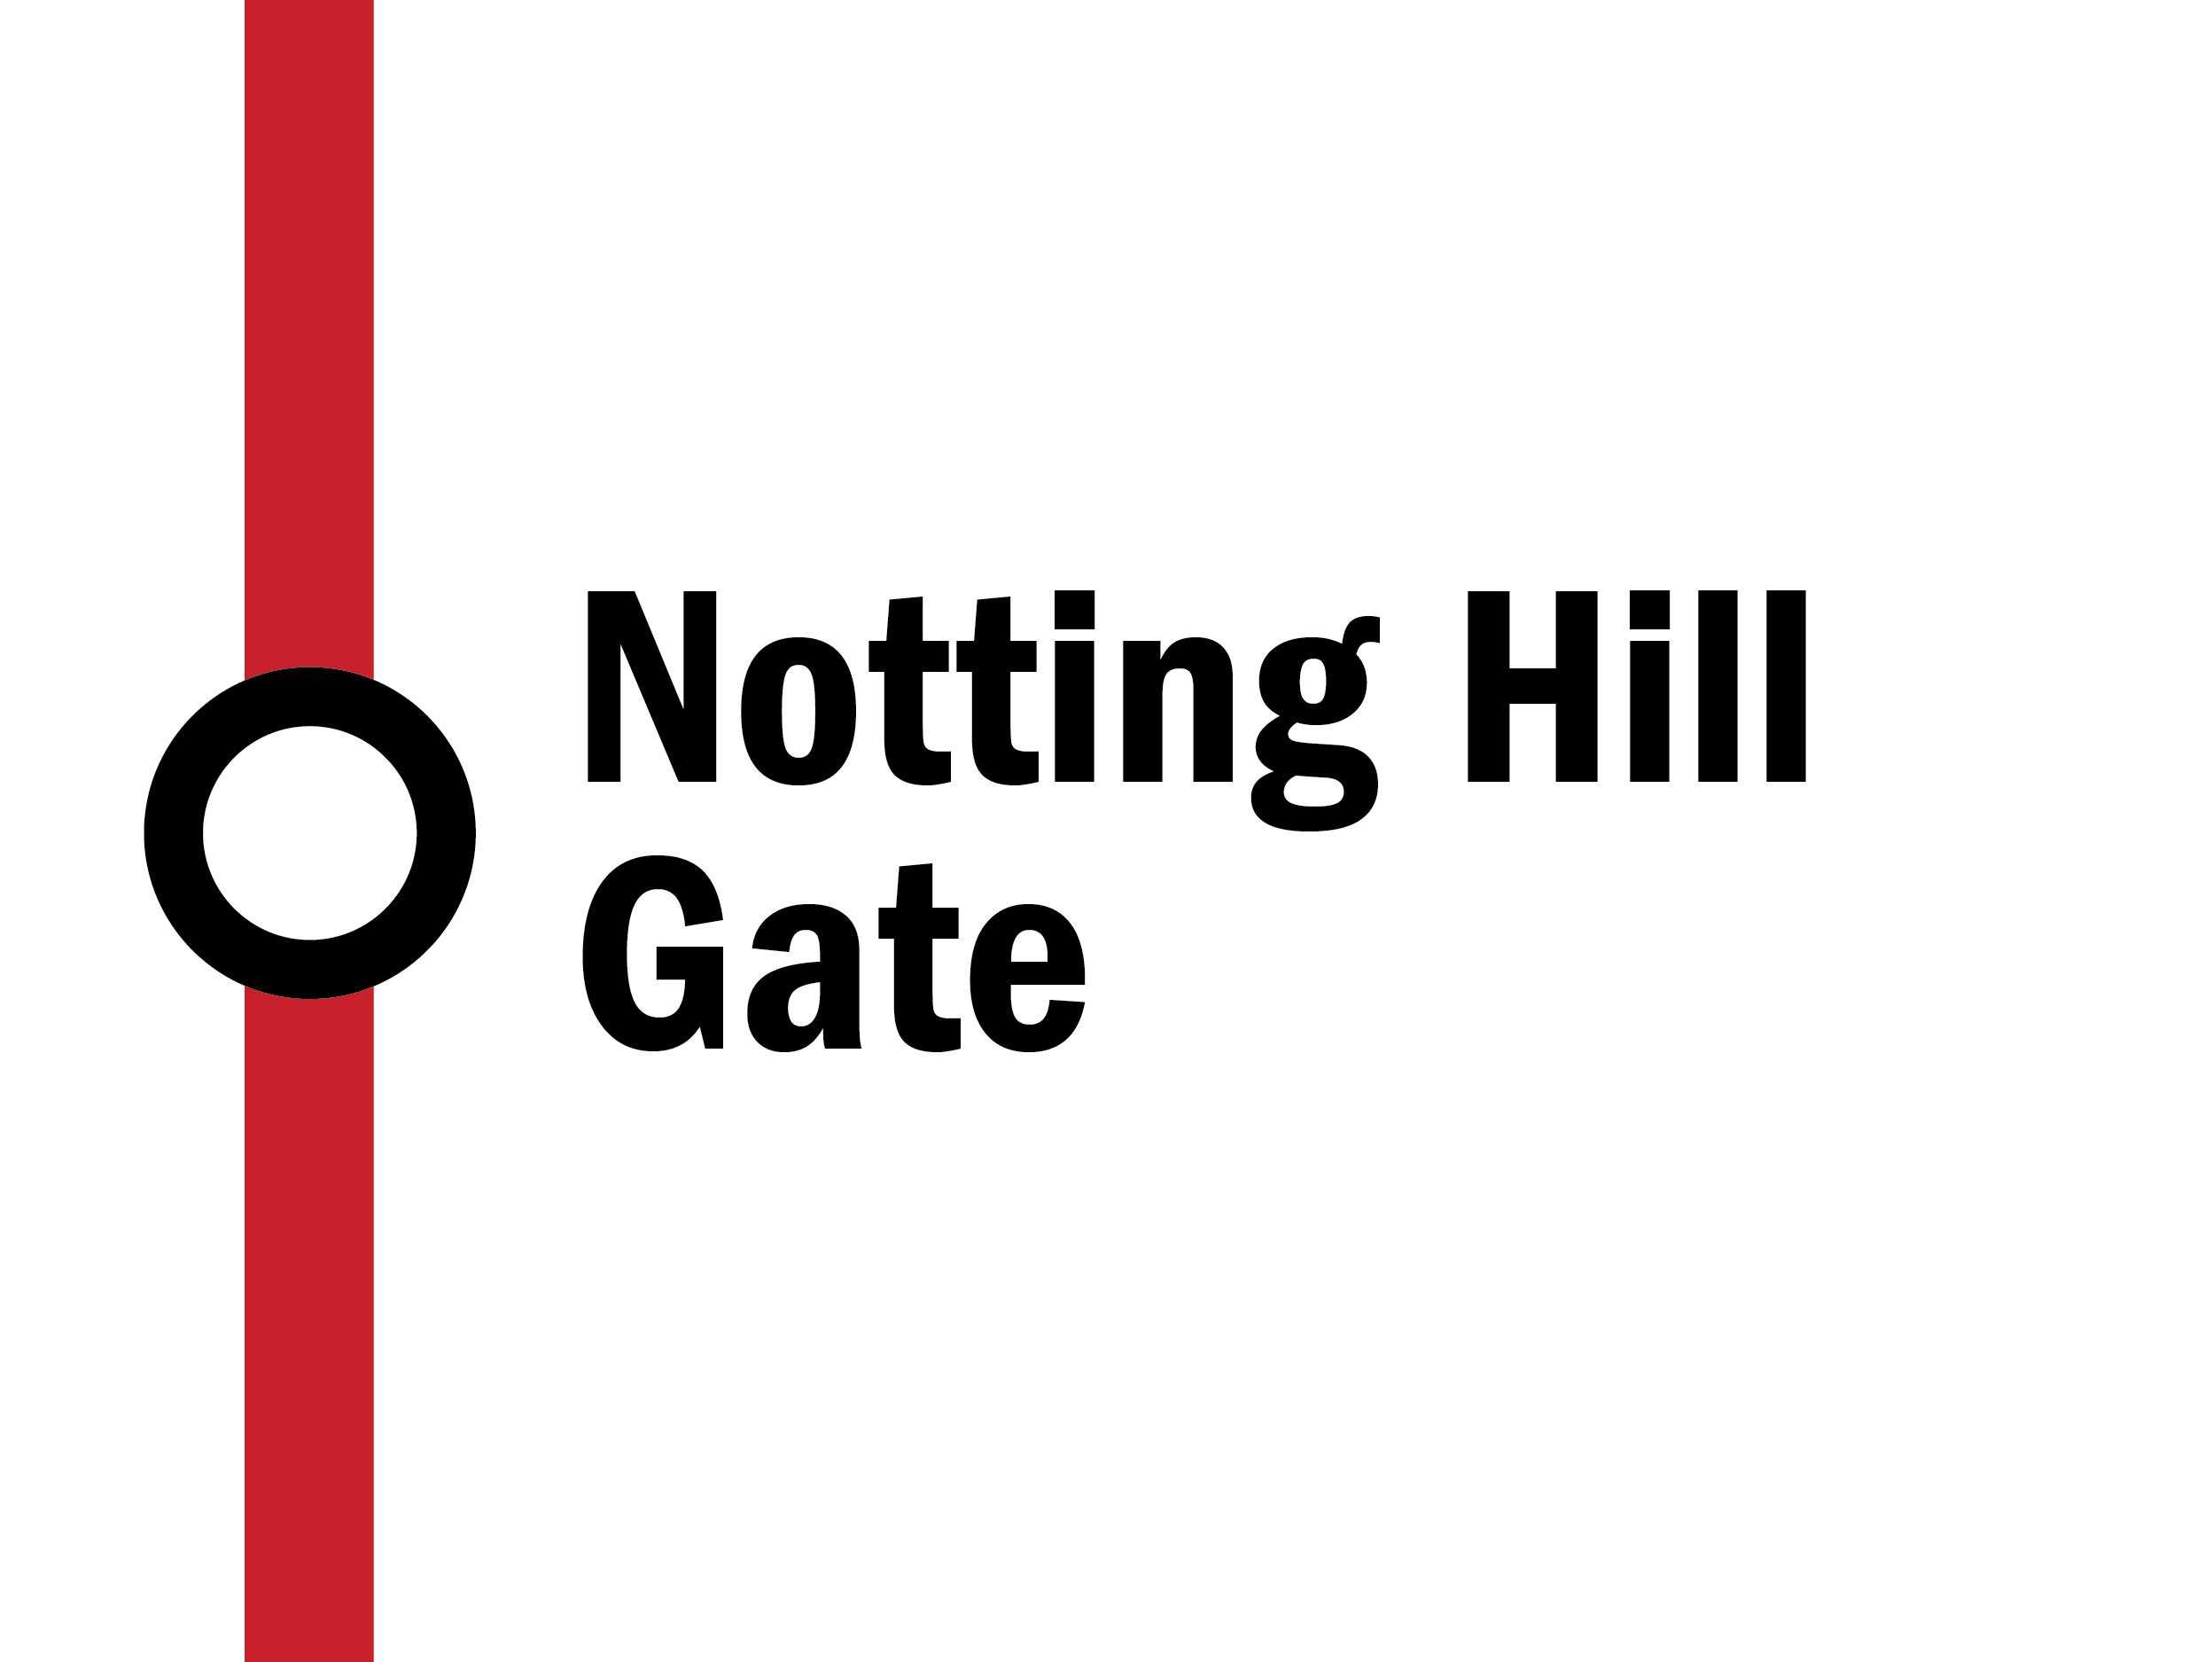 Night tube: Notting Hill Gate